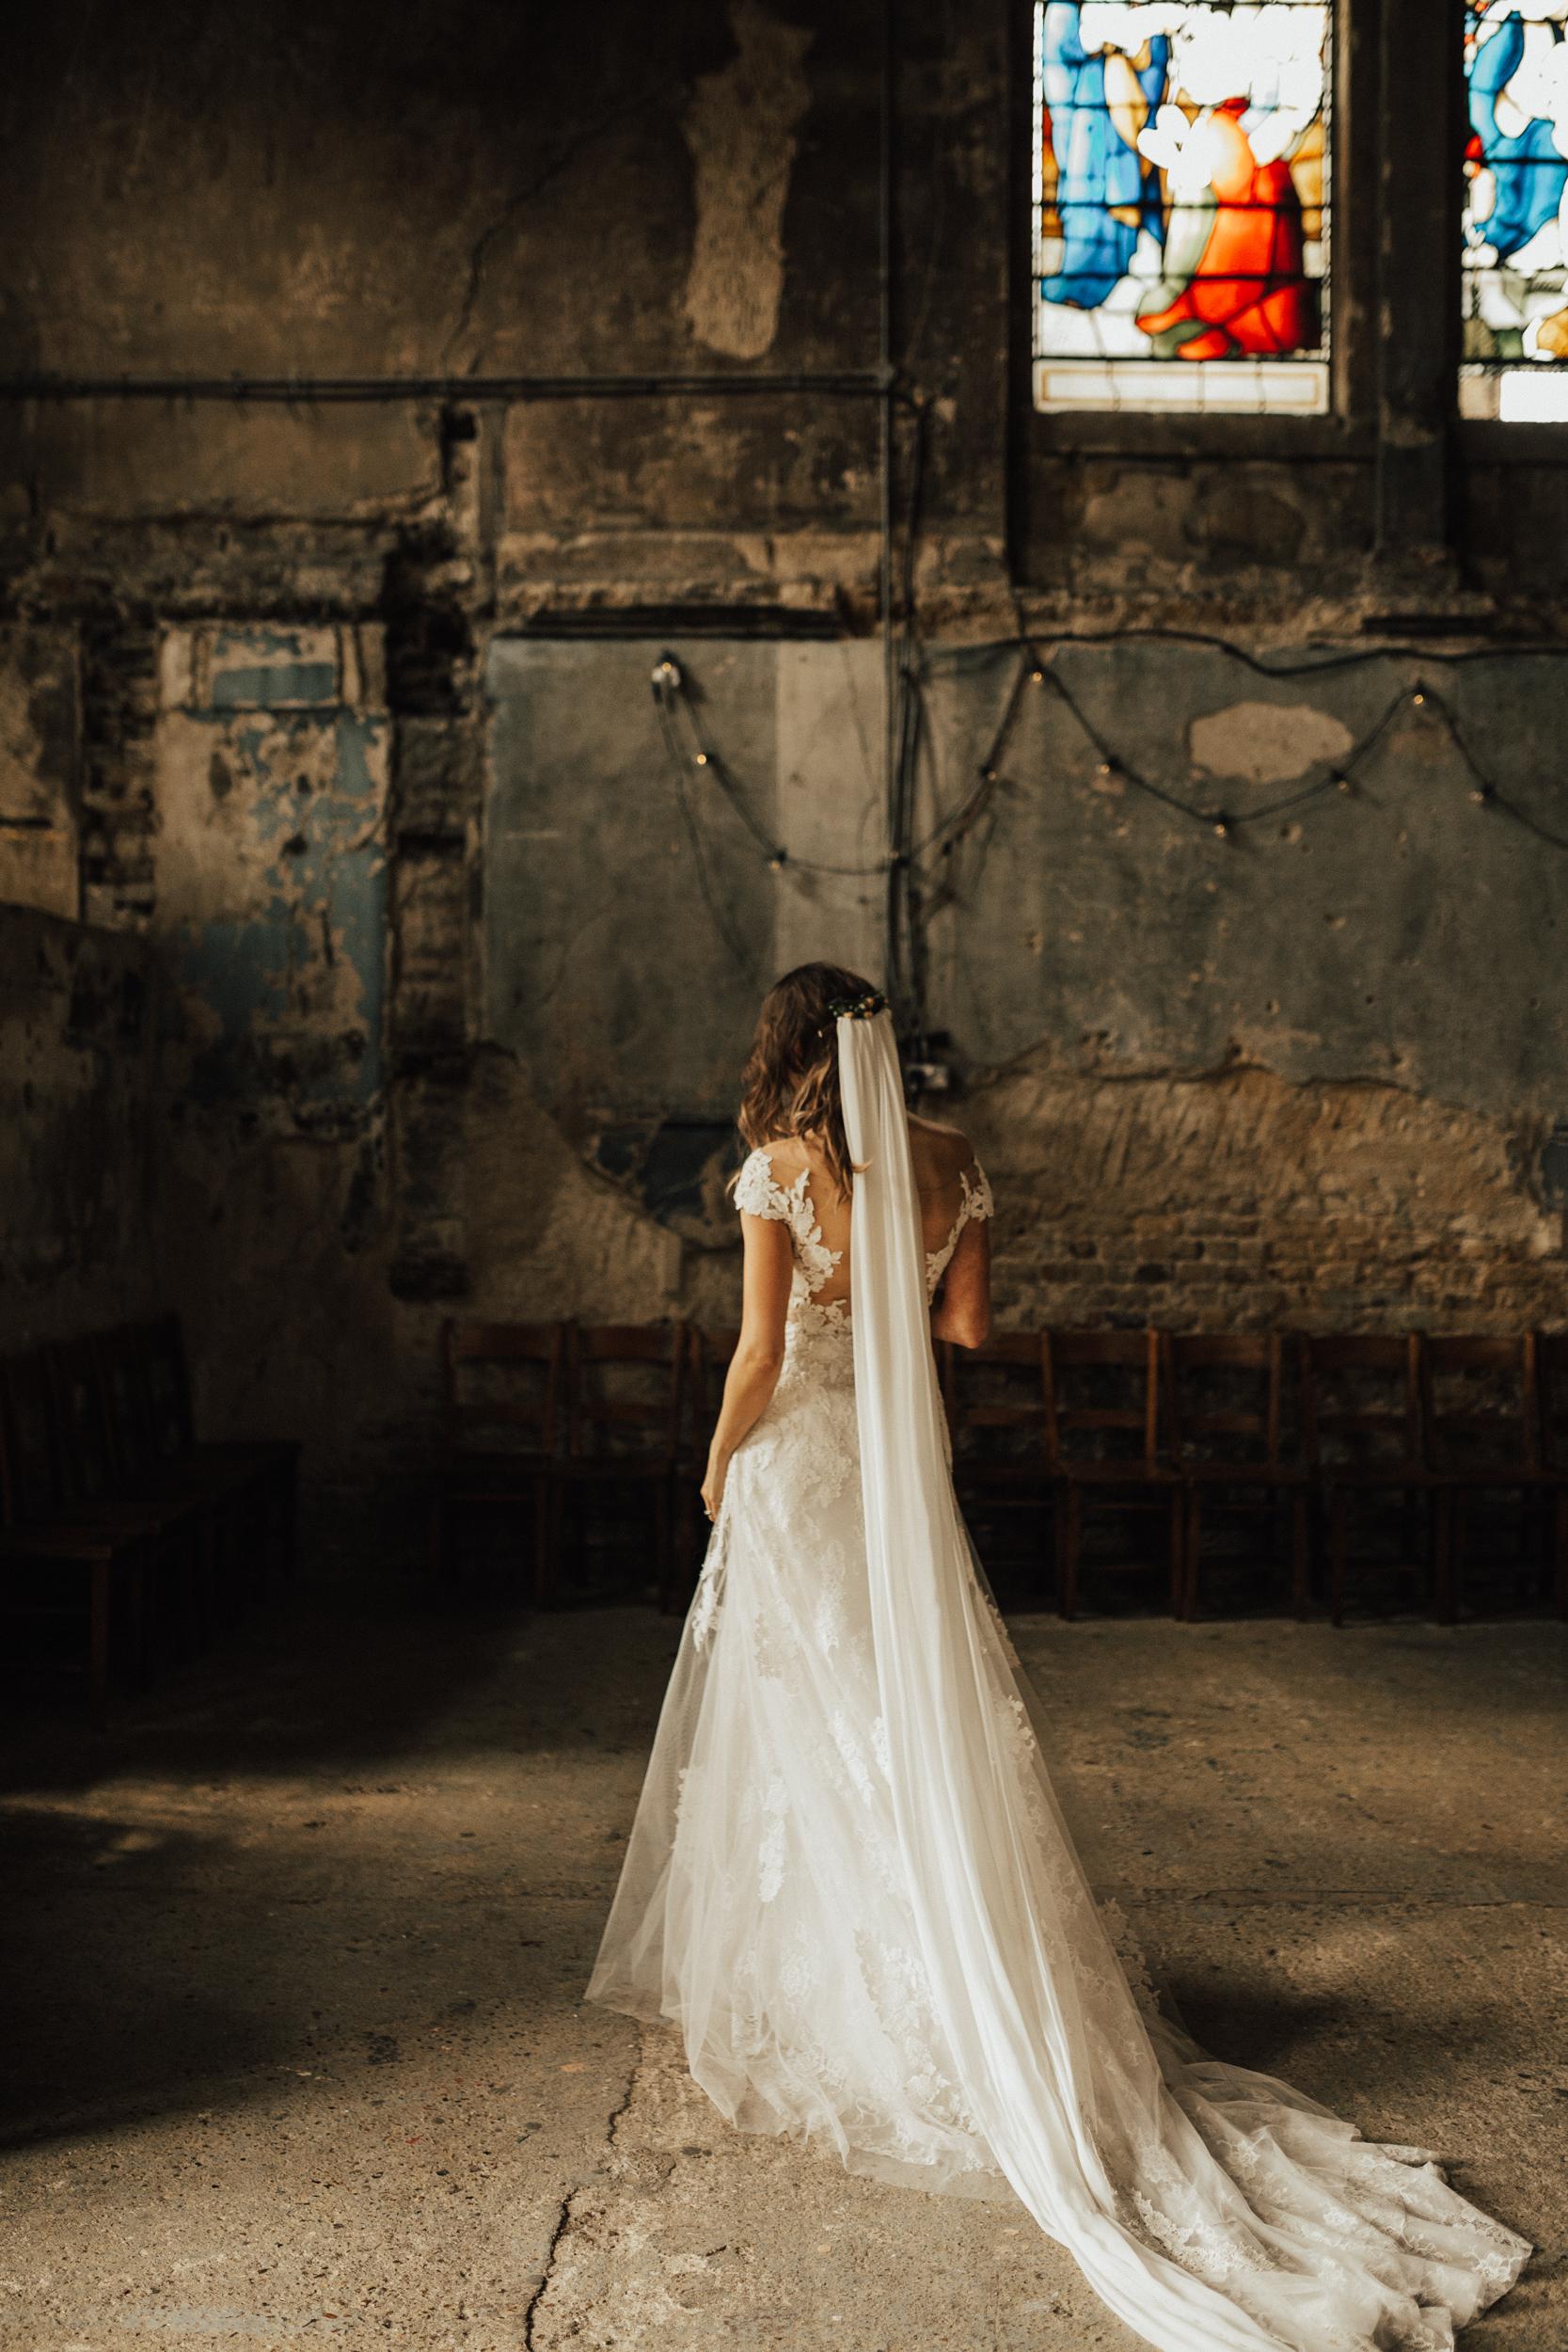 Laura-Benn-The-Asylum-London-The-Ace-Hotel-Wedding-Alternative-Darina-Stoda-Photography-366.jpg